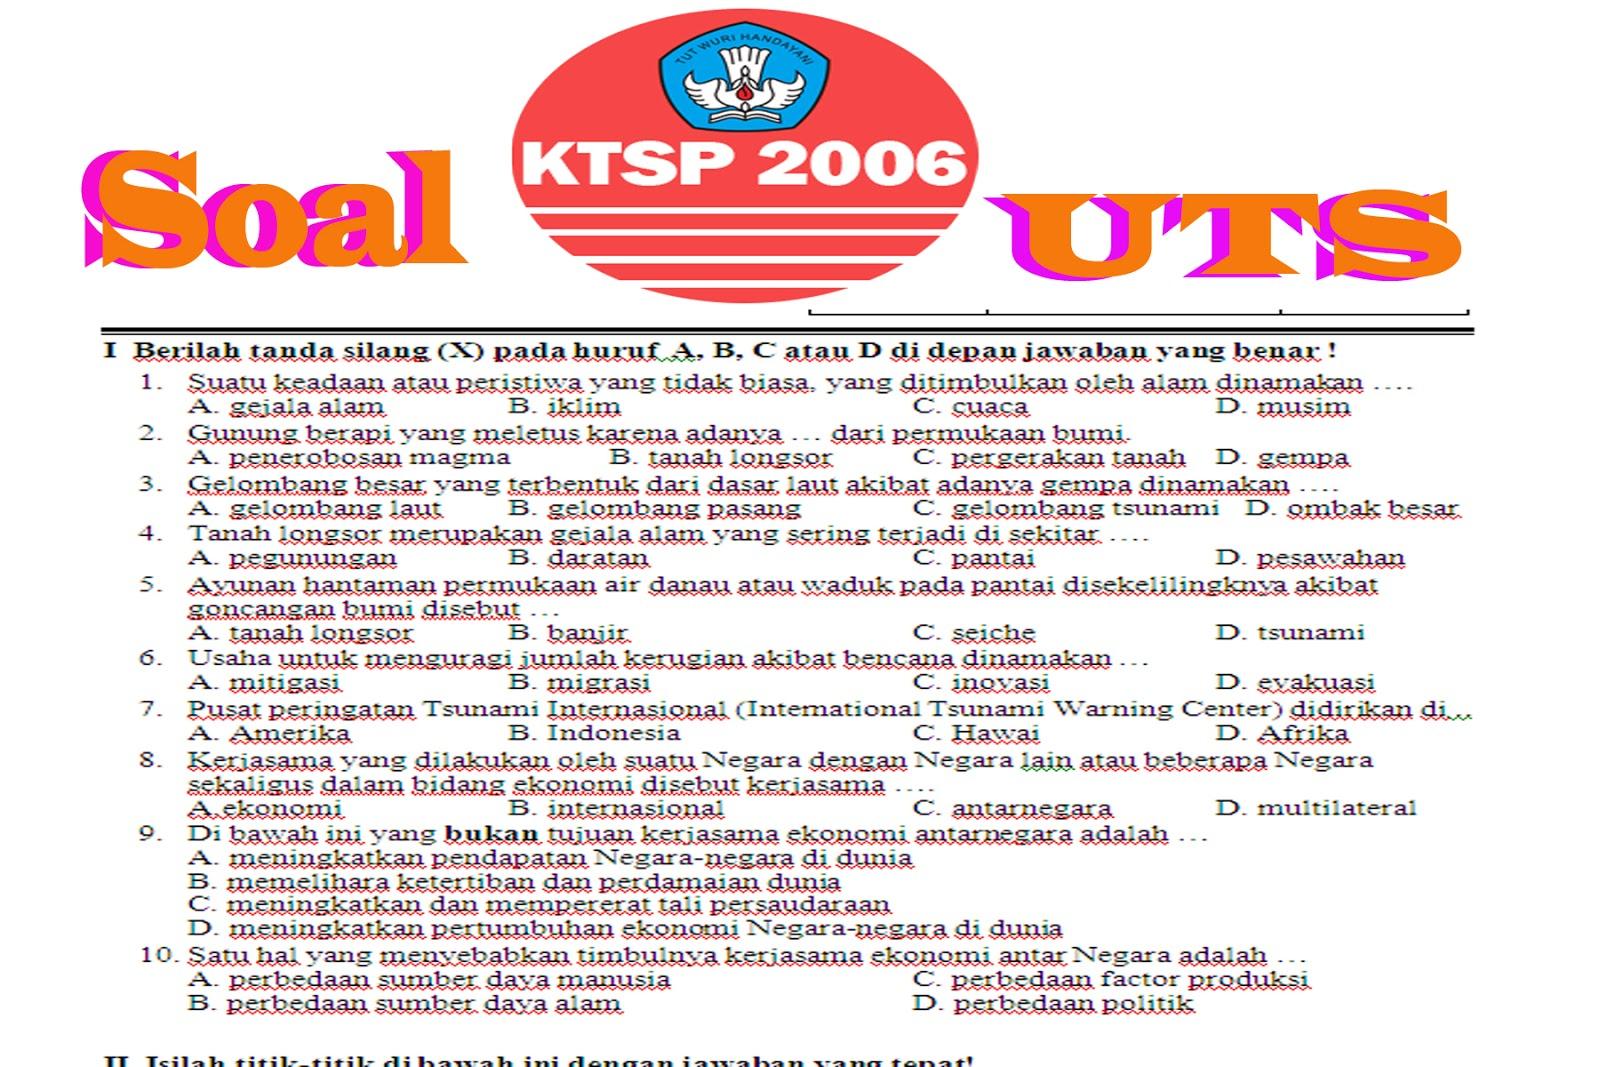 Download Contoh Soal Uts Semester 1 Tahun 2015 Untuk Sd Semua Kelas Berkas Edukasi